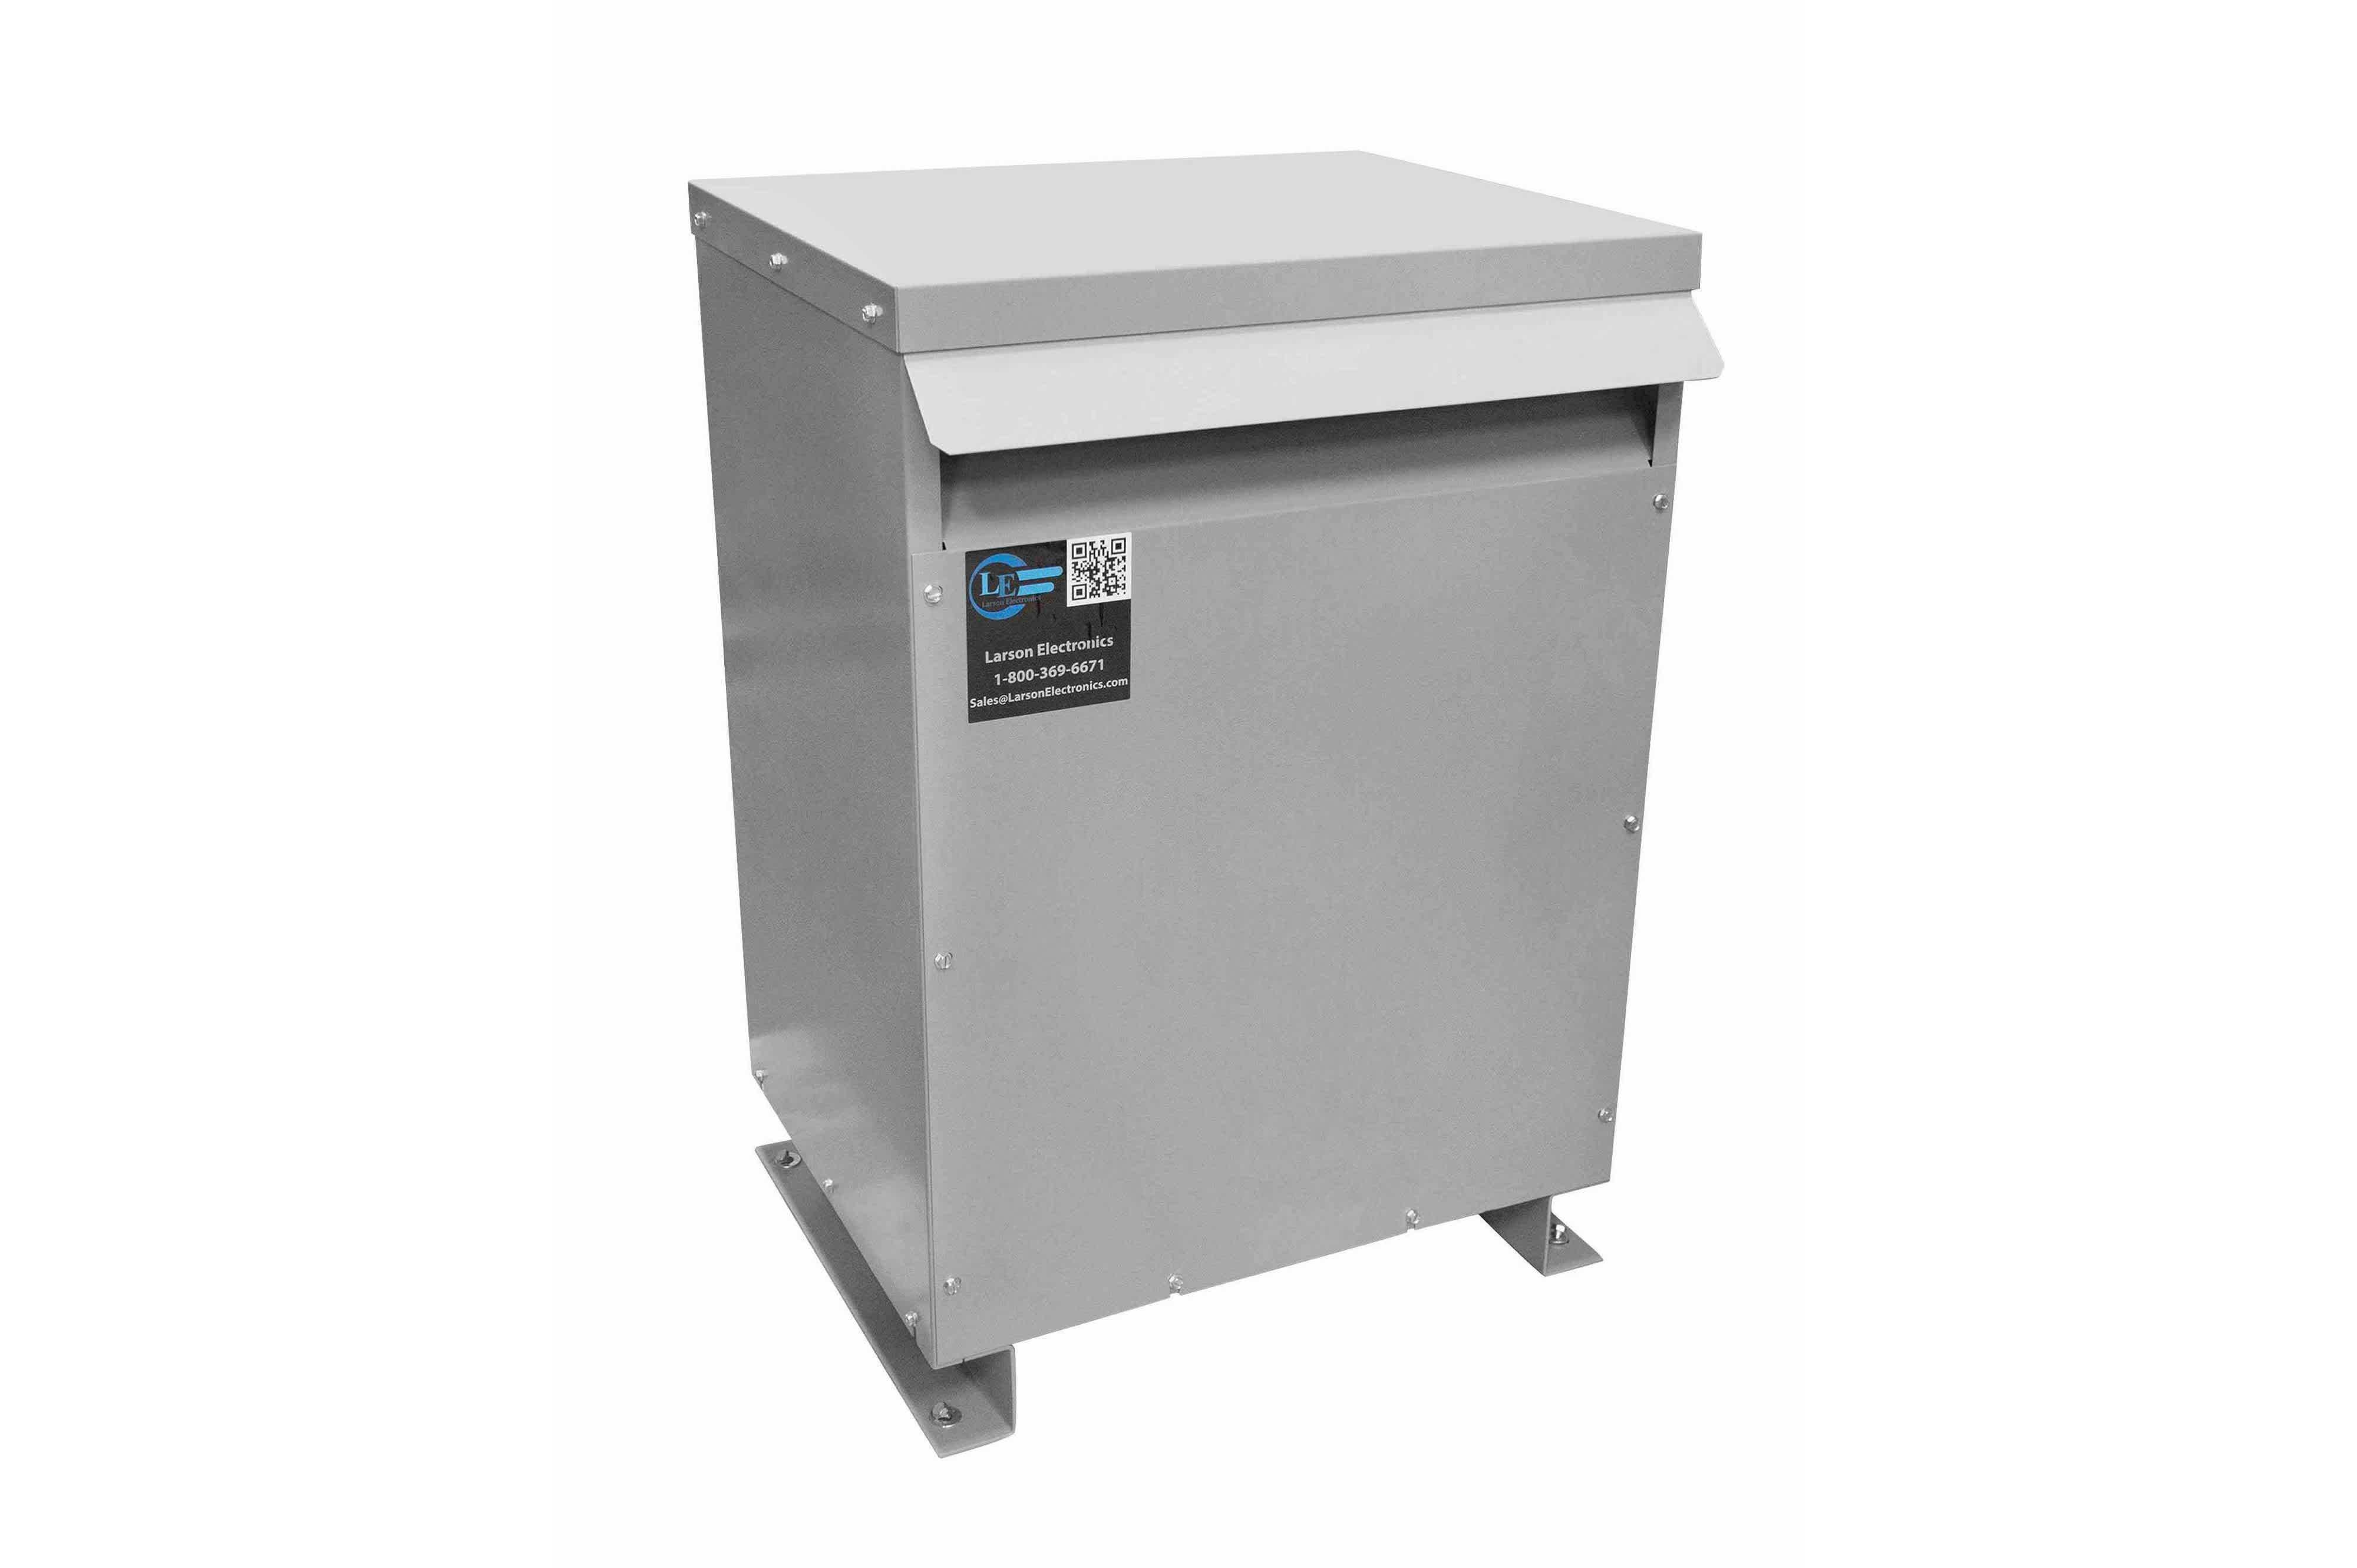 10 kVA 3PH DOE Transformer, 208V Delta Primary, 208Y/120 Wye-N Secondary, N3R, Ventilated, 60 Hz